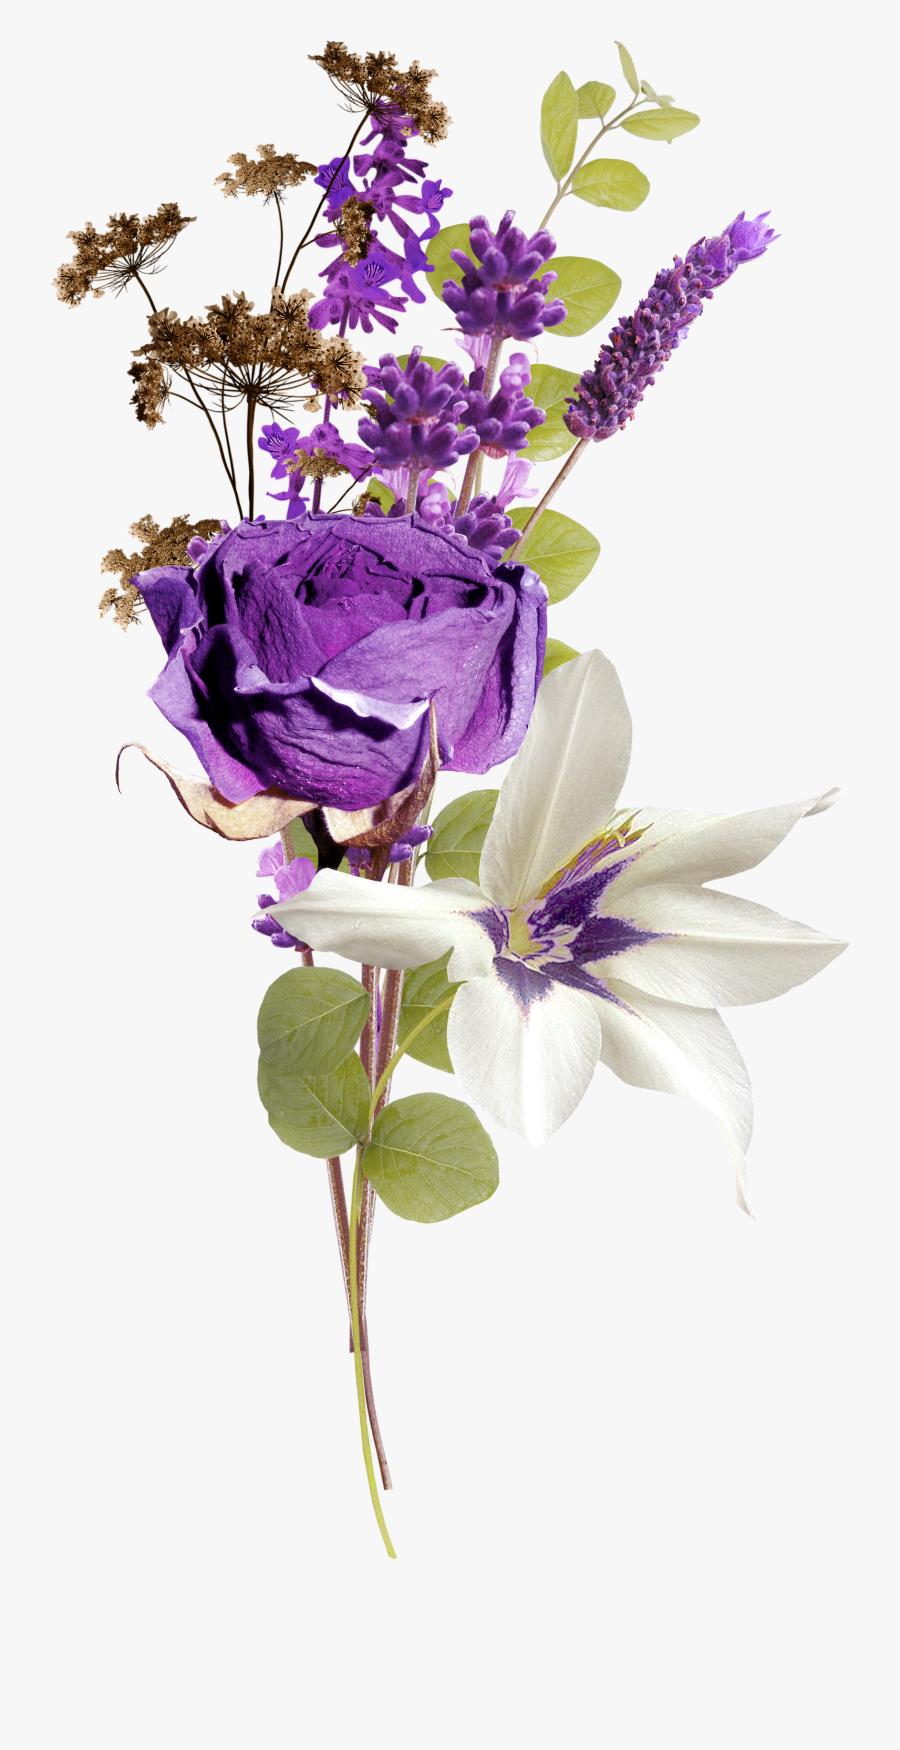 Lavender Clipart Stem - Тату Лаванда На Прозрачном Фоне, Transparent Clipart